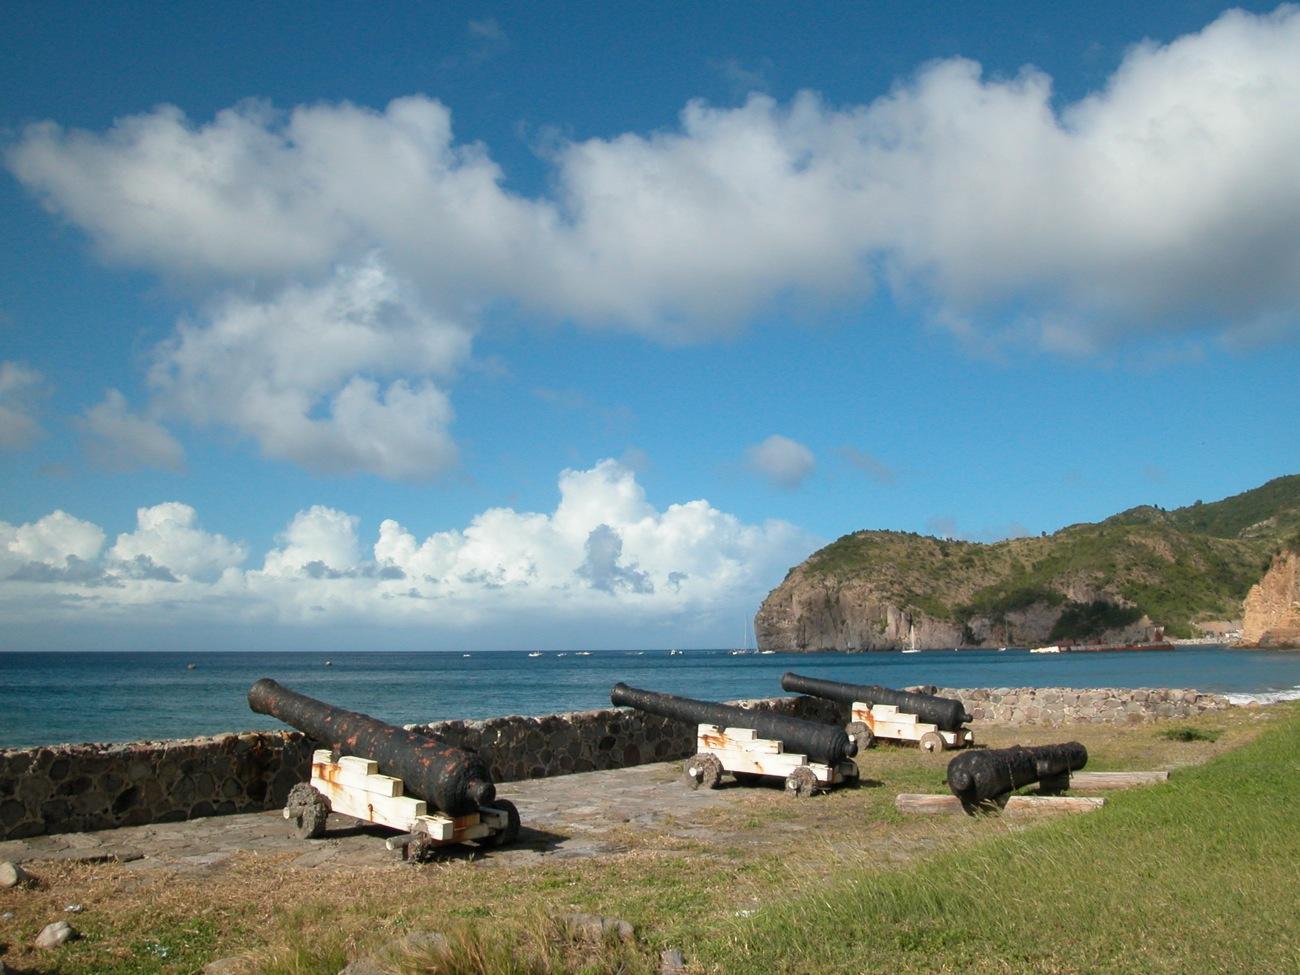 Montserrat Island ... VEC, ARRL, JARL, Yaesu, Icom, AES, Amateur Electronic Supply, GigaParts, ...